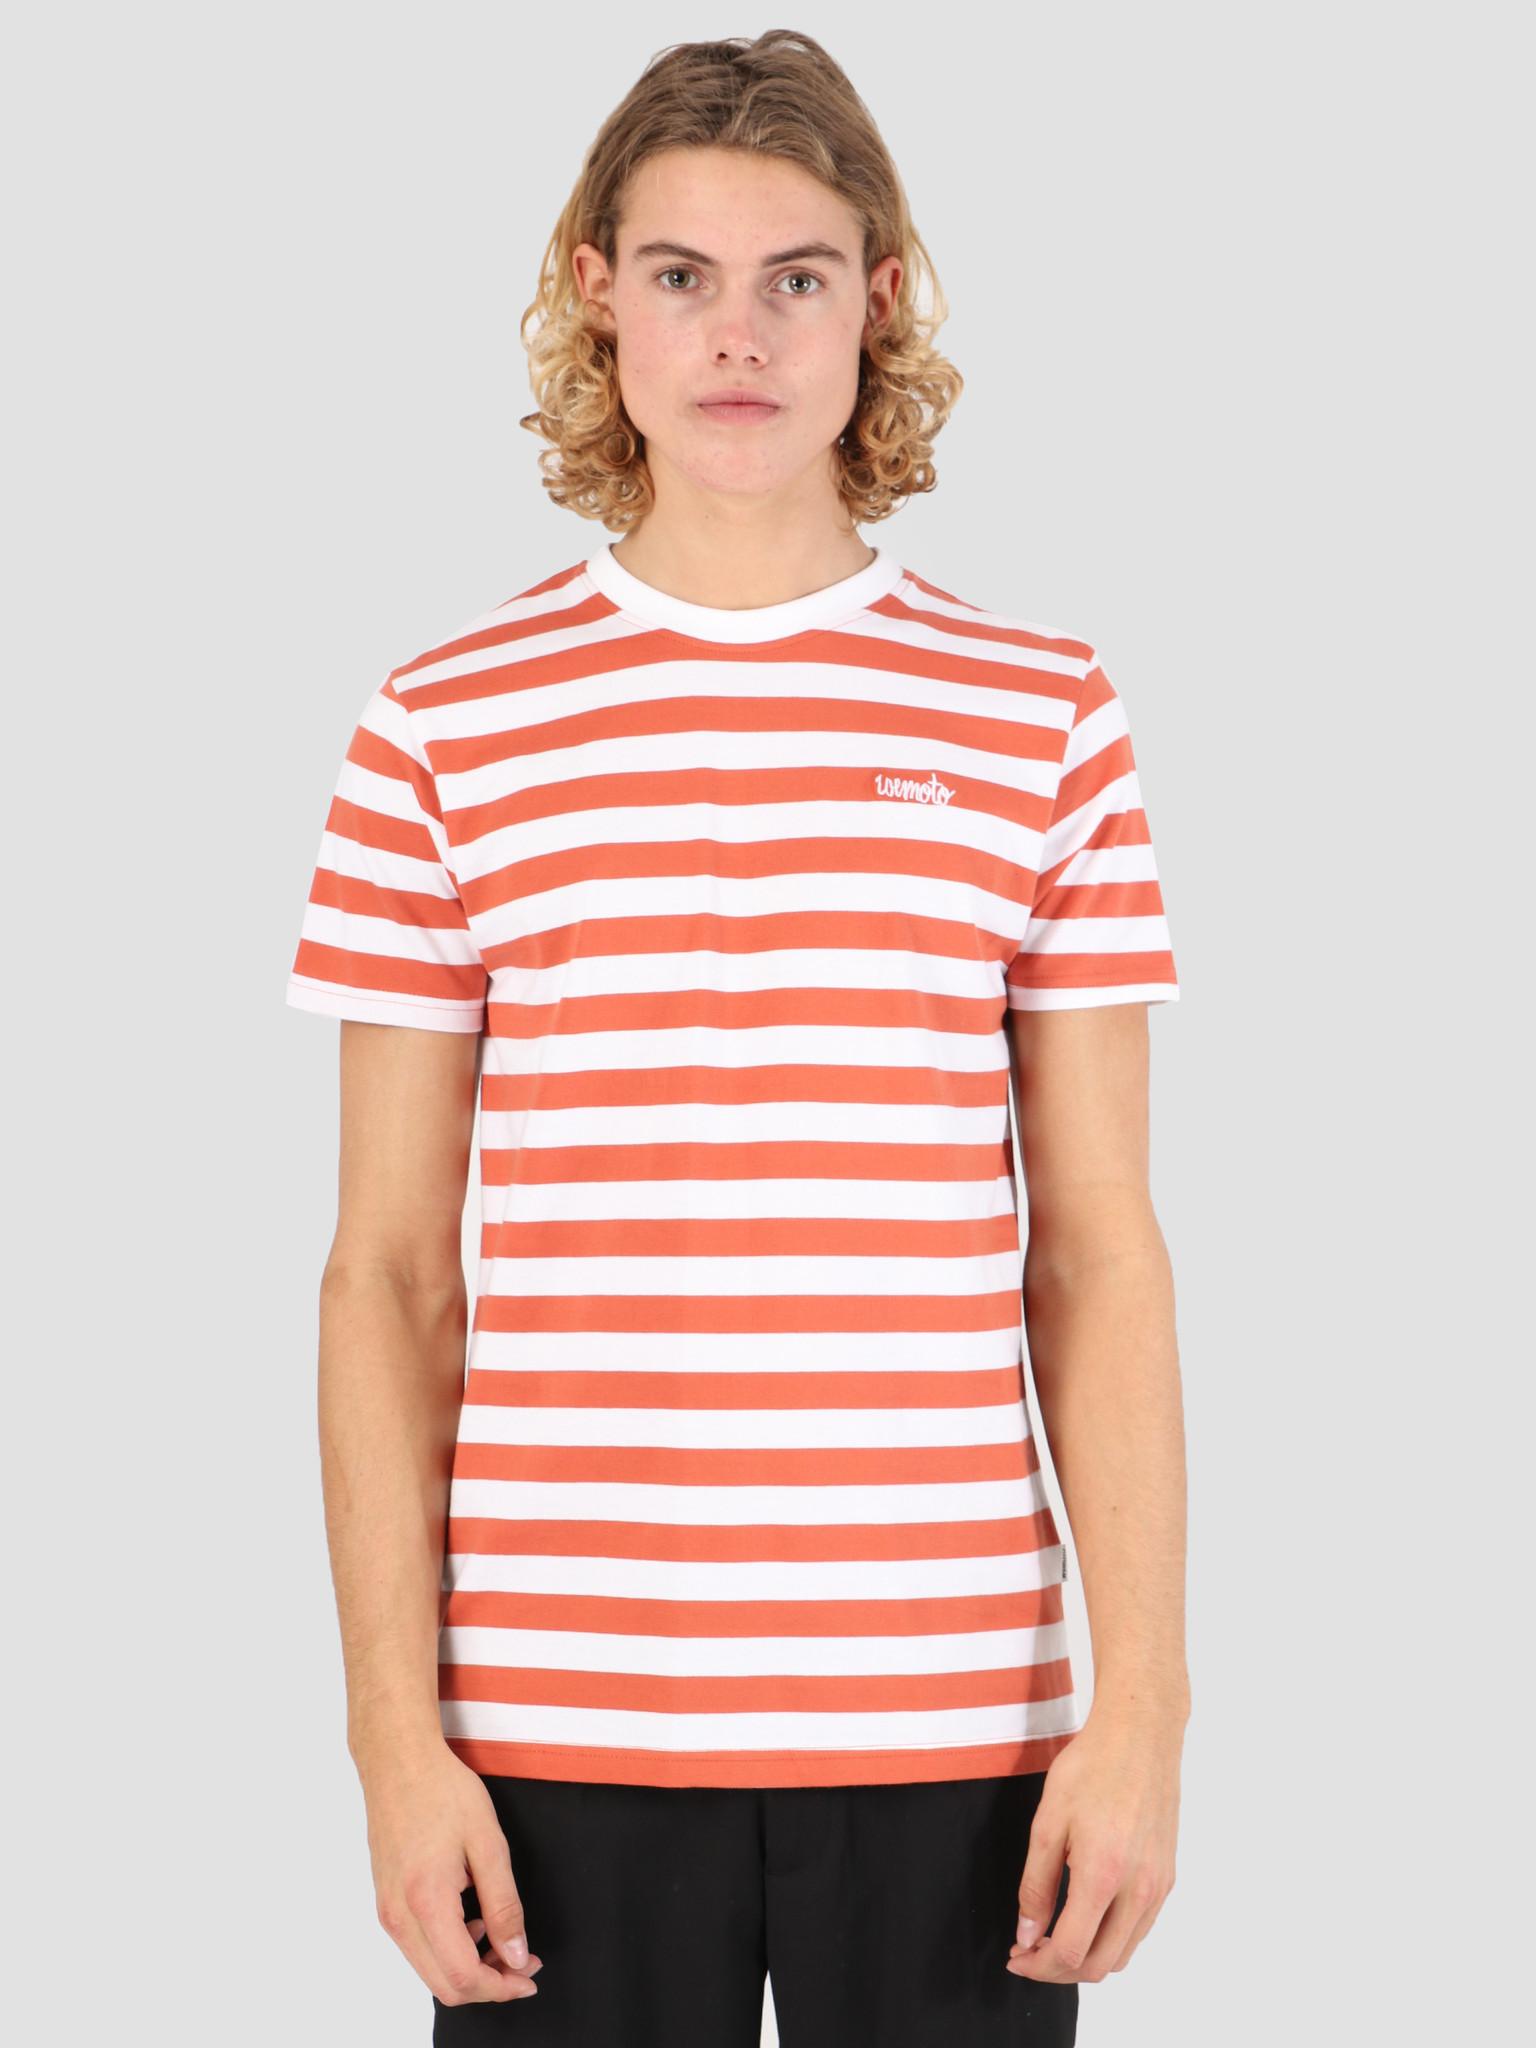 Wemoto Wemoto Script Stripe Jersey Emberglow-White 131.223-560